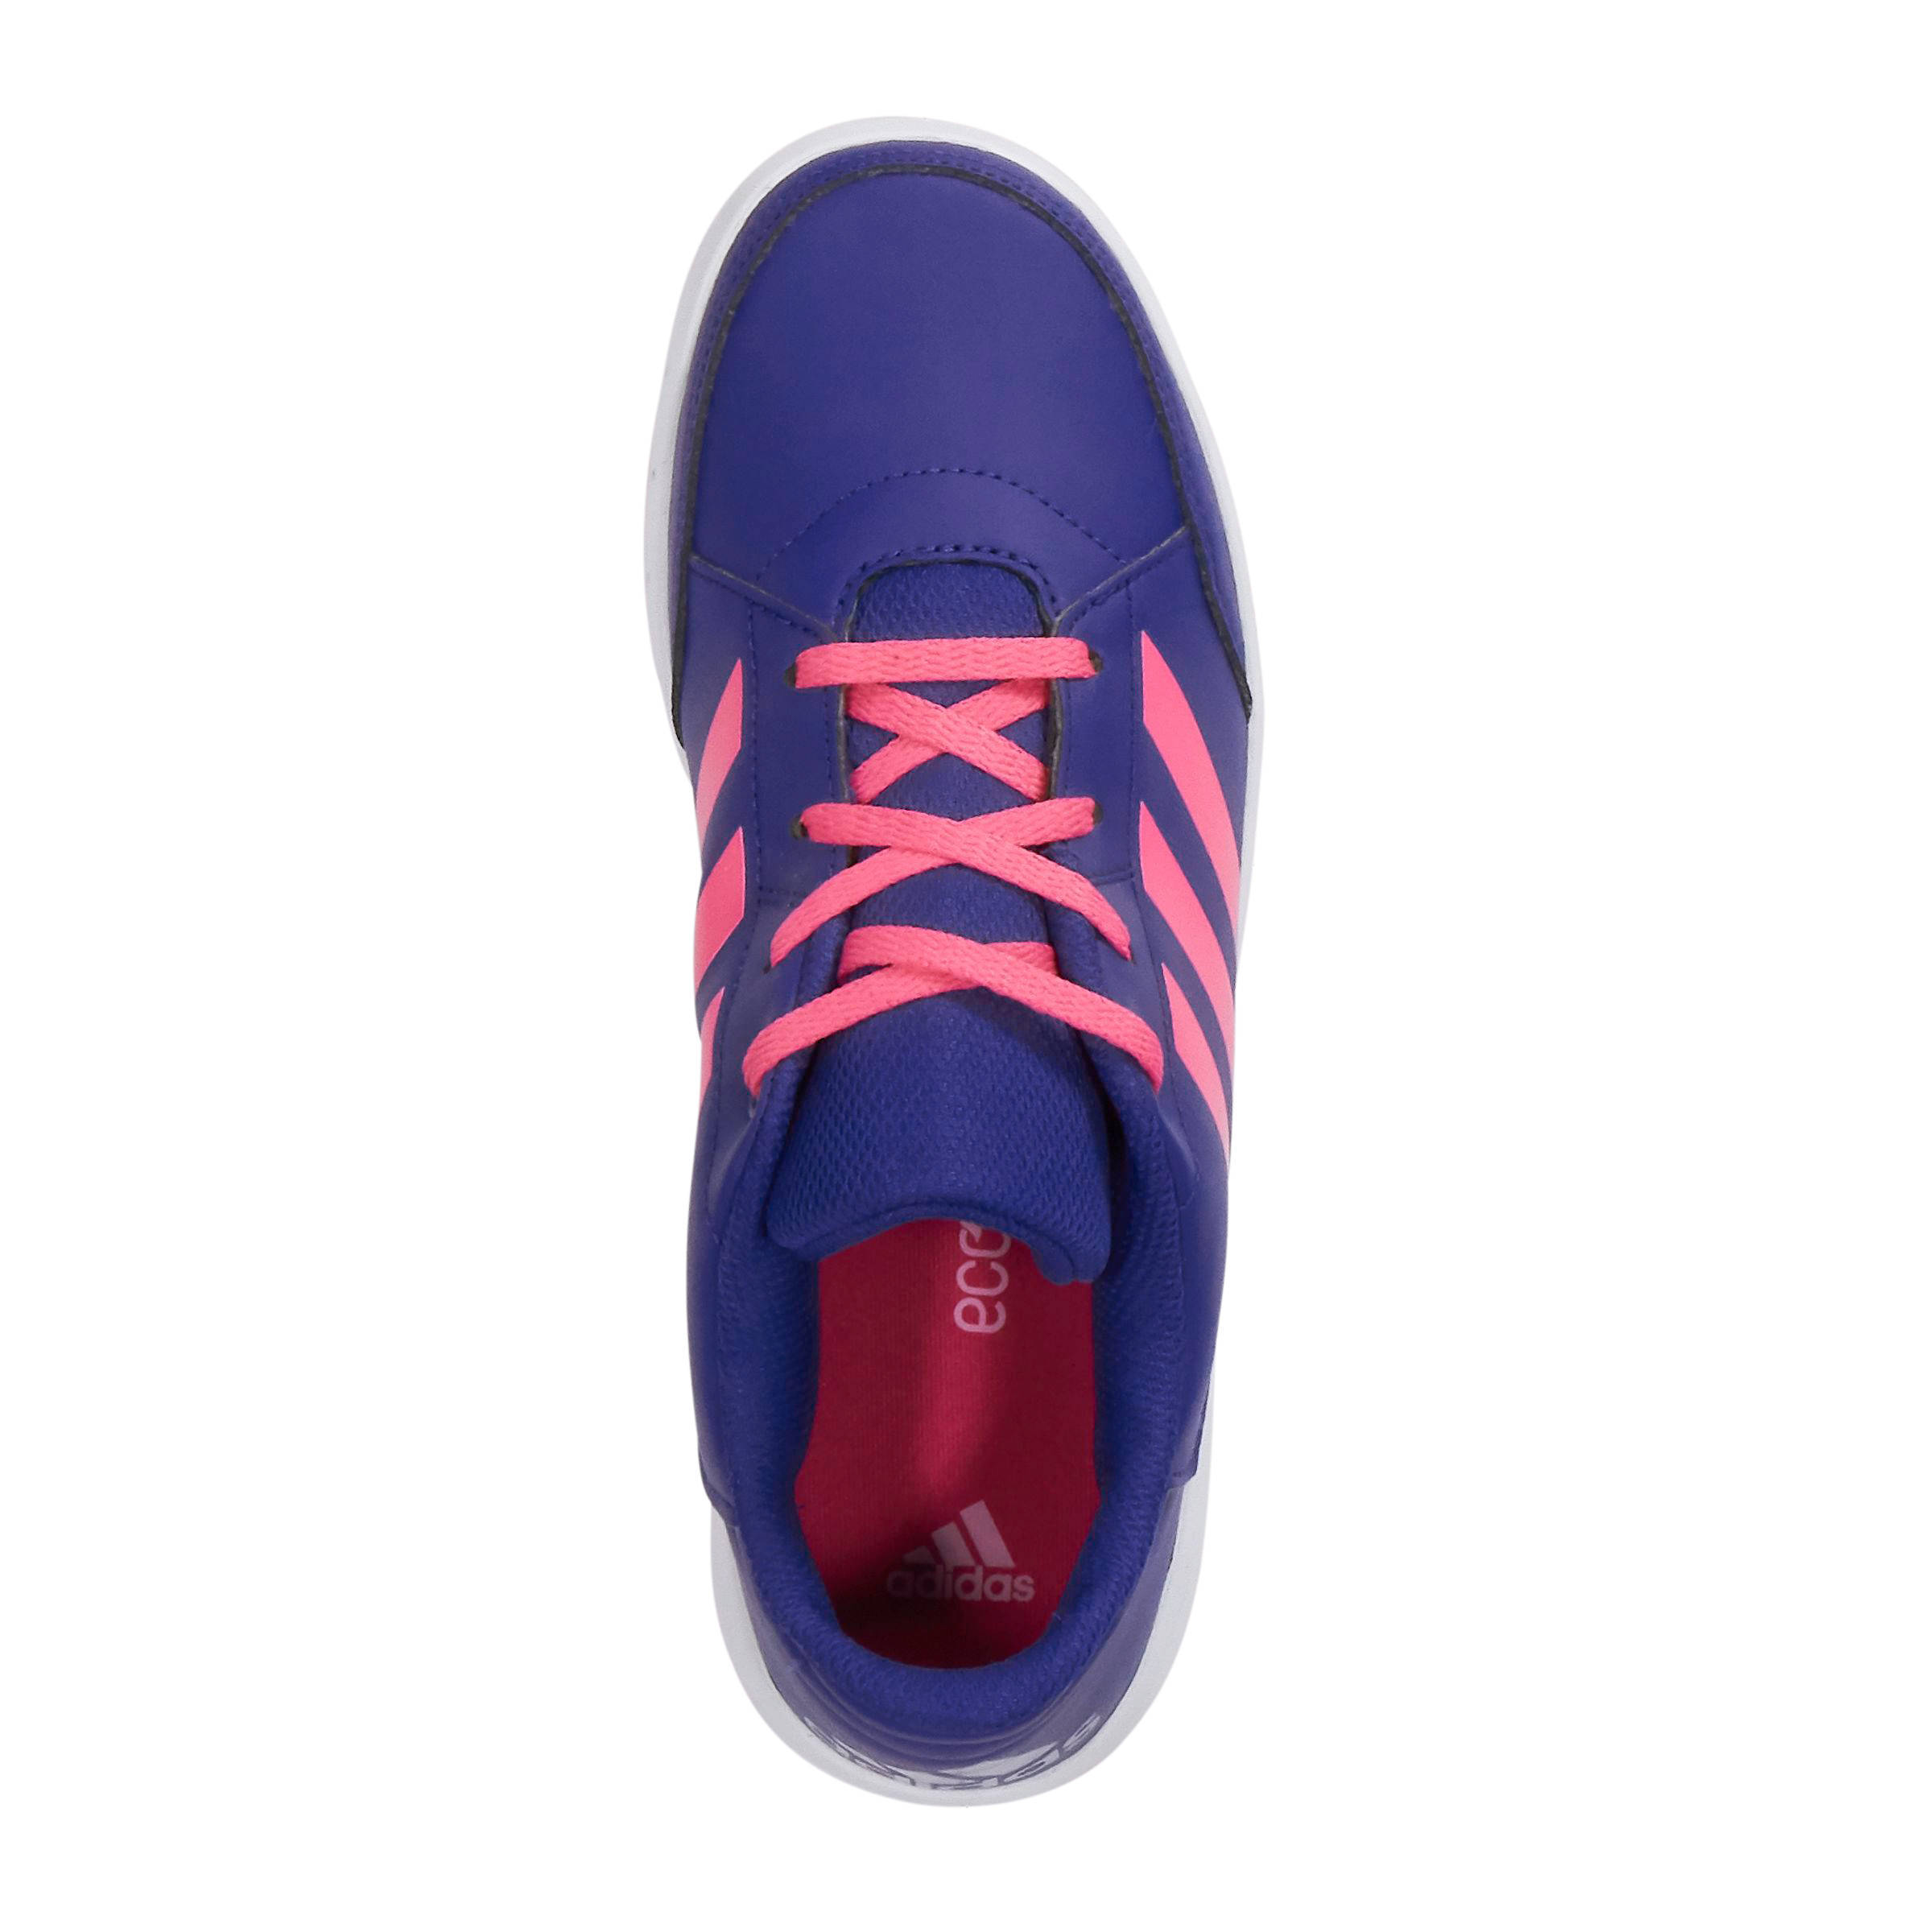 31cc27b7c57 adidas performance kids AltaSport sportschoenen blauw/roze   wehkamp